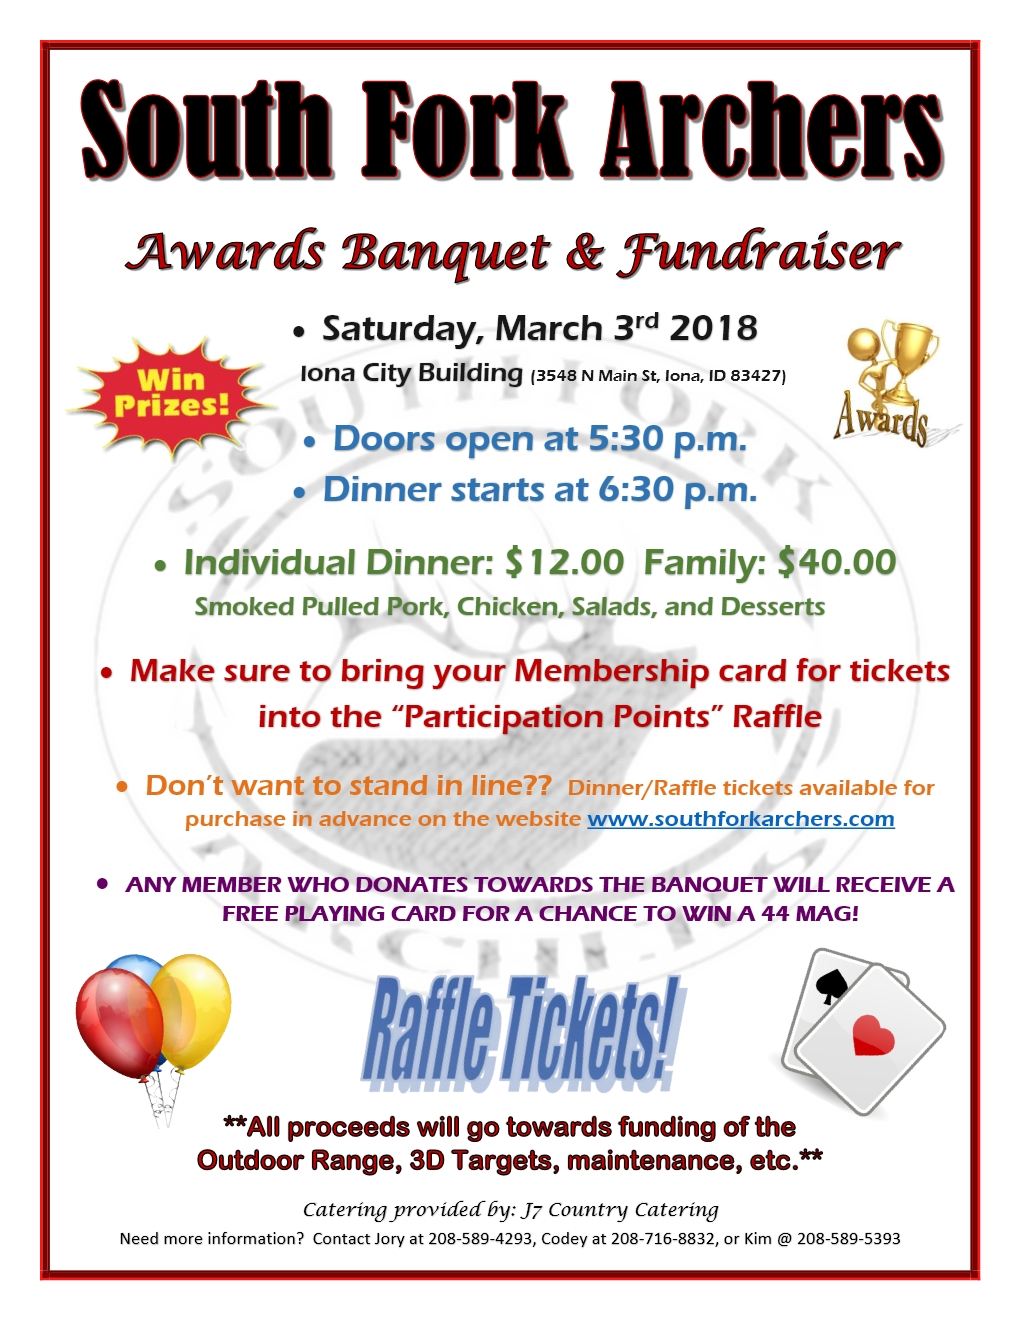 South Fork Archers 2017 Banquet